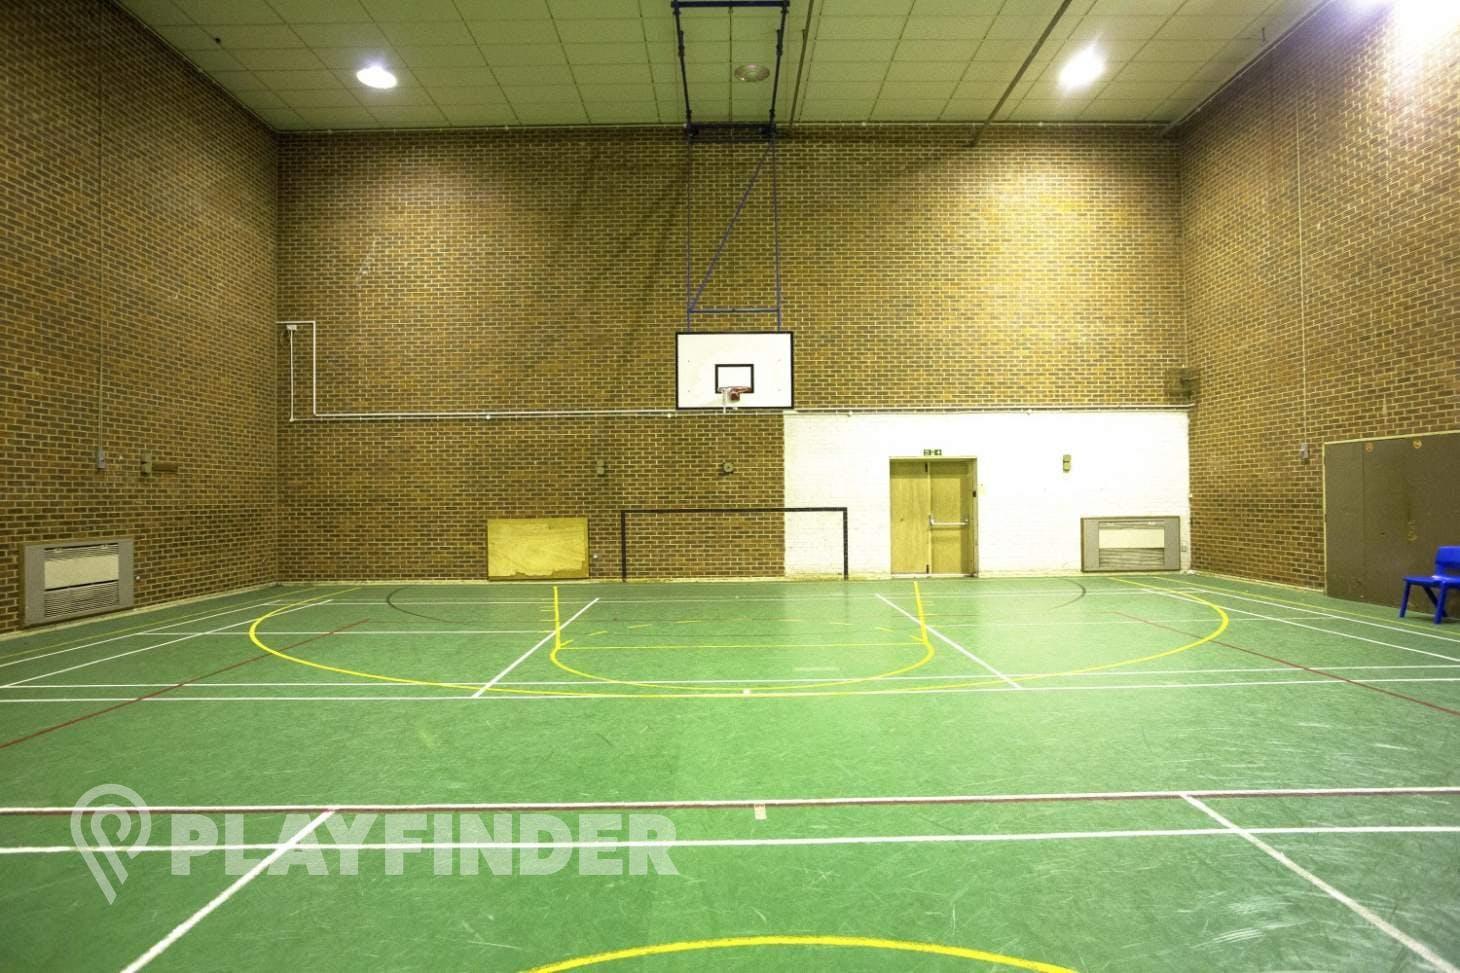 Christ's College Finchley Indoor | Hard badminton court